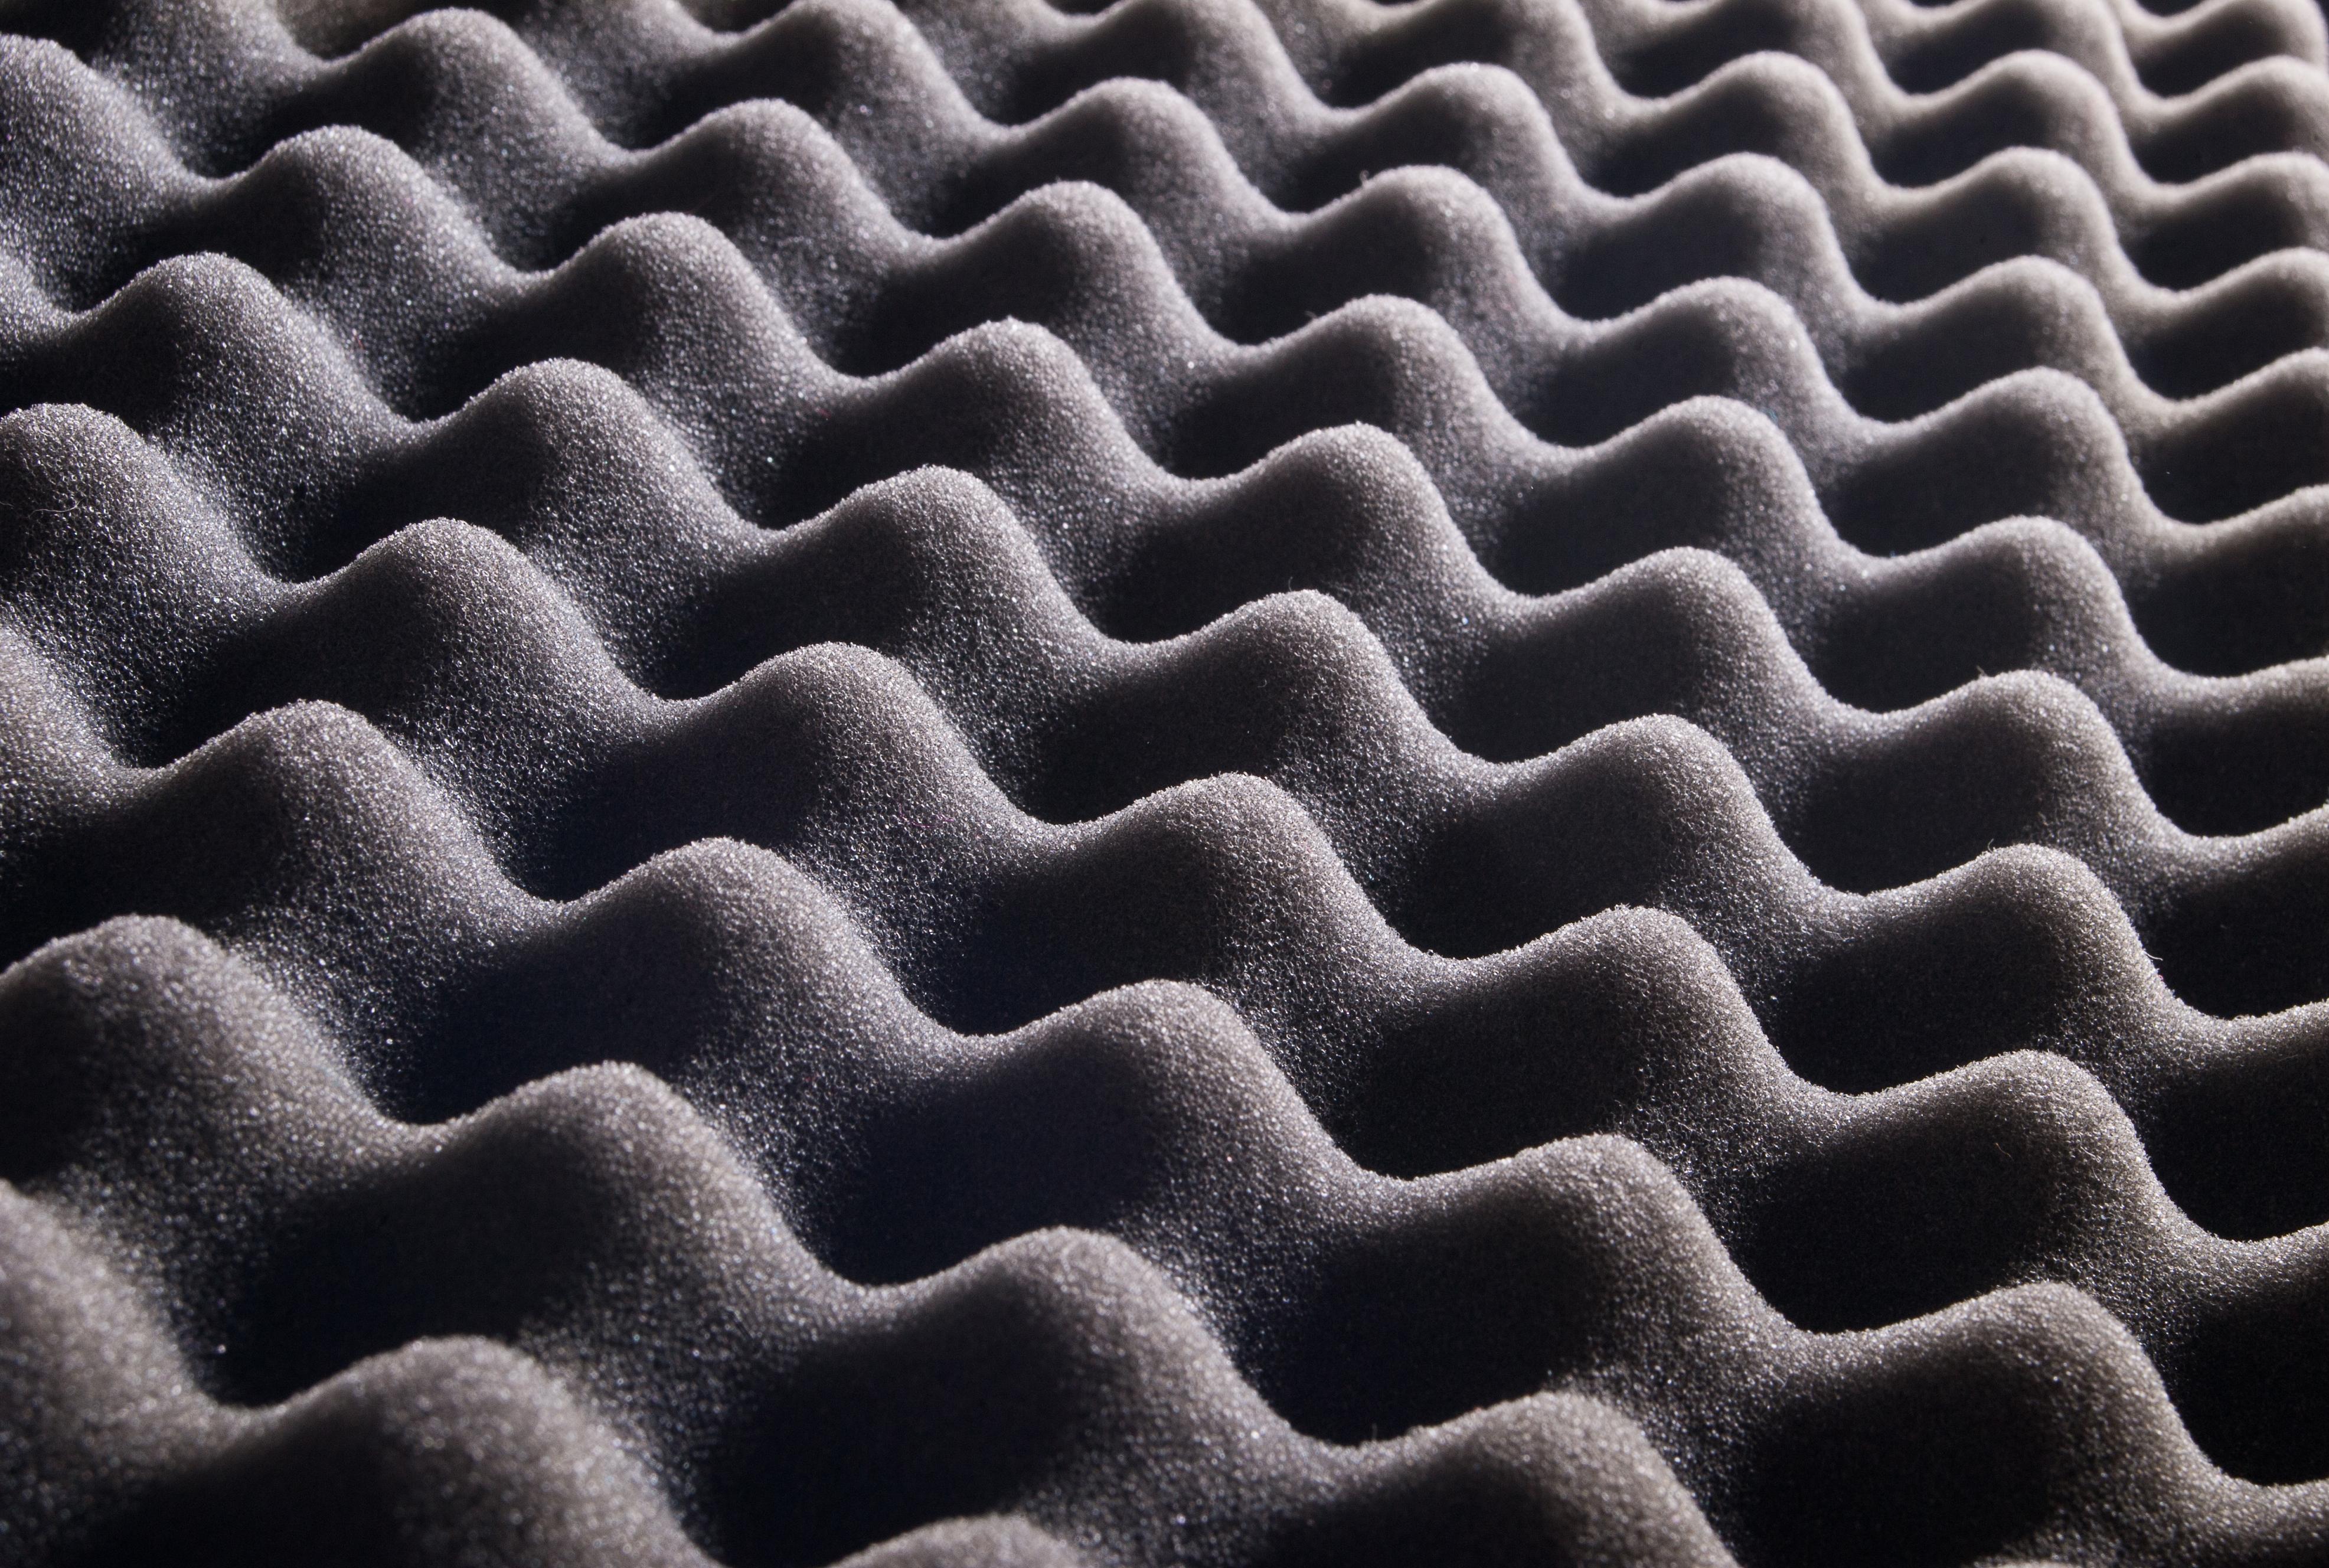 How to Dissolve Polyurethane Foam | Hunker